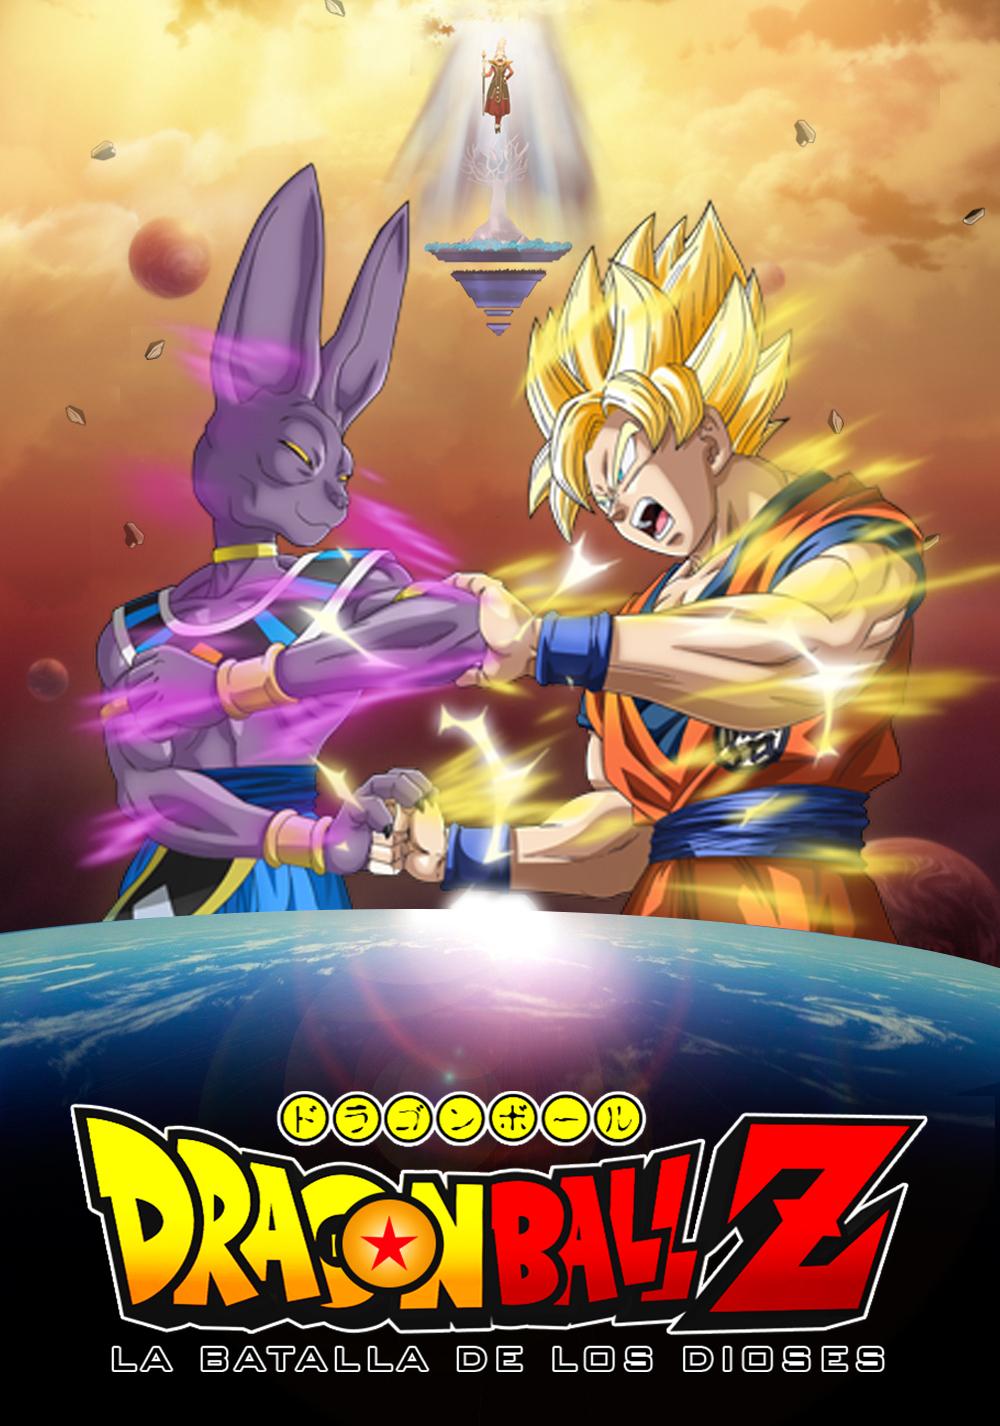 dragon ball z battle of gods movie fanart fanarttv